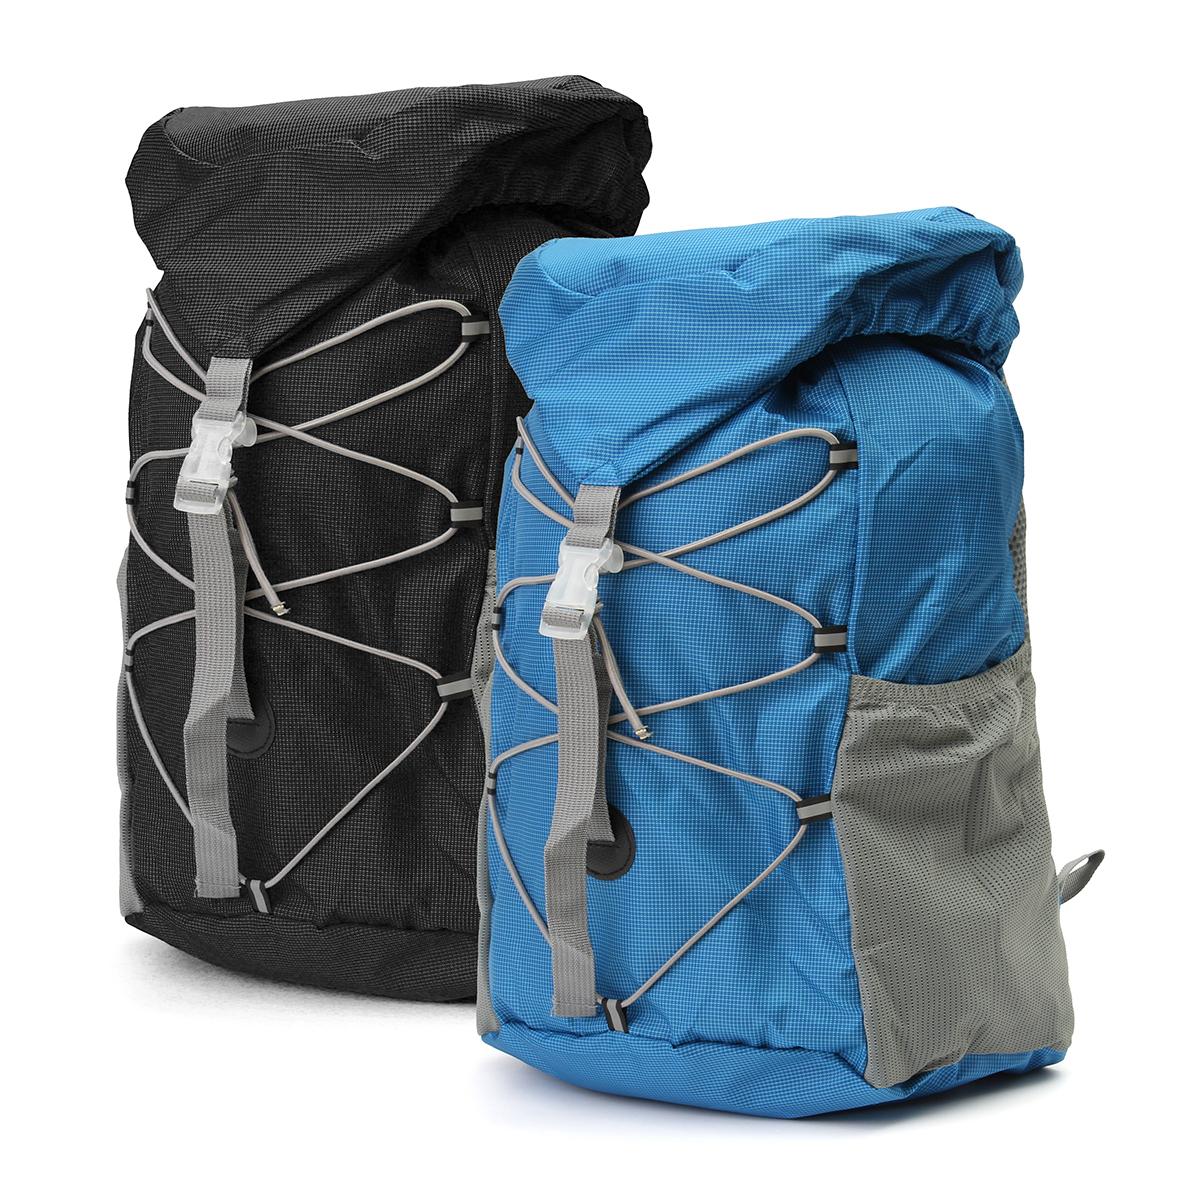 33L Outdoor Sport Backpack Unisex Waterproof Camping Hi